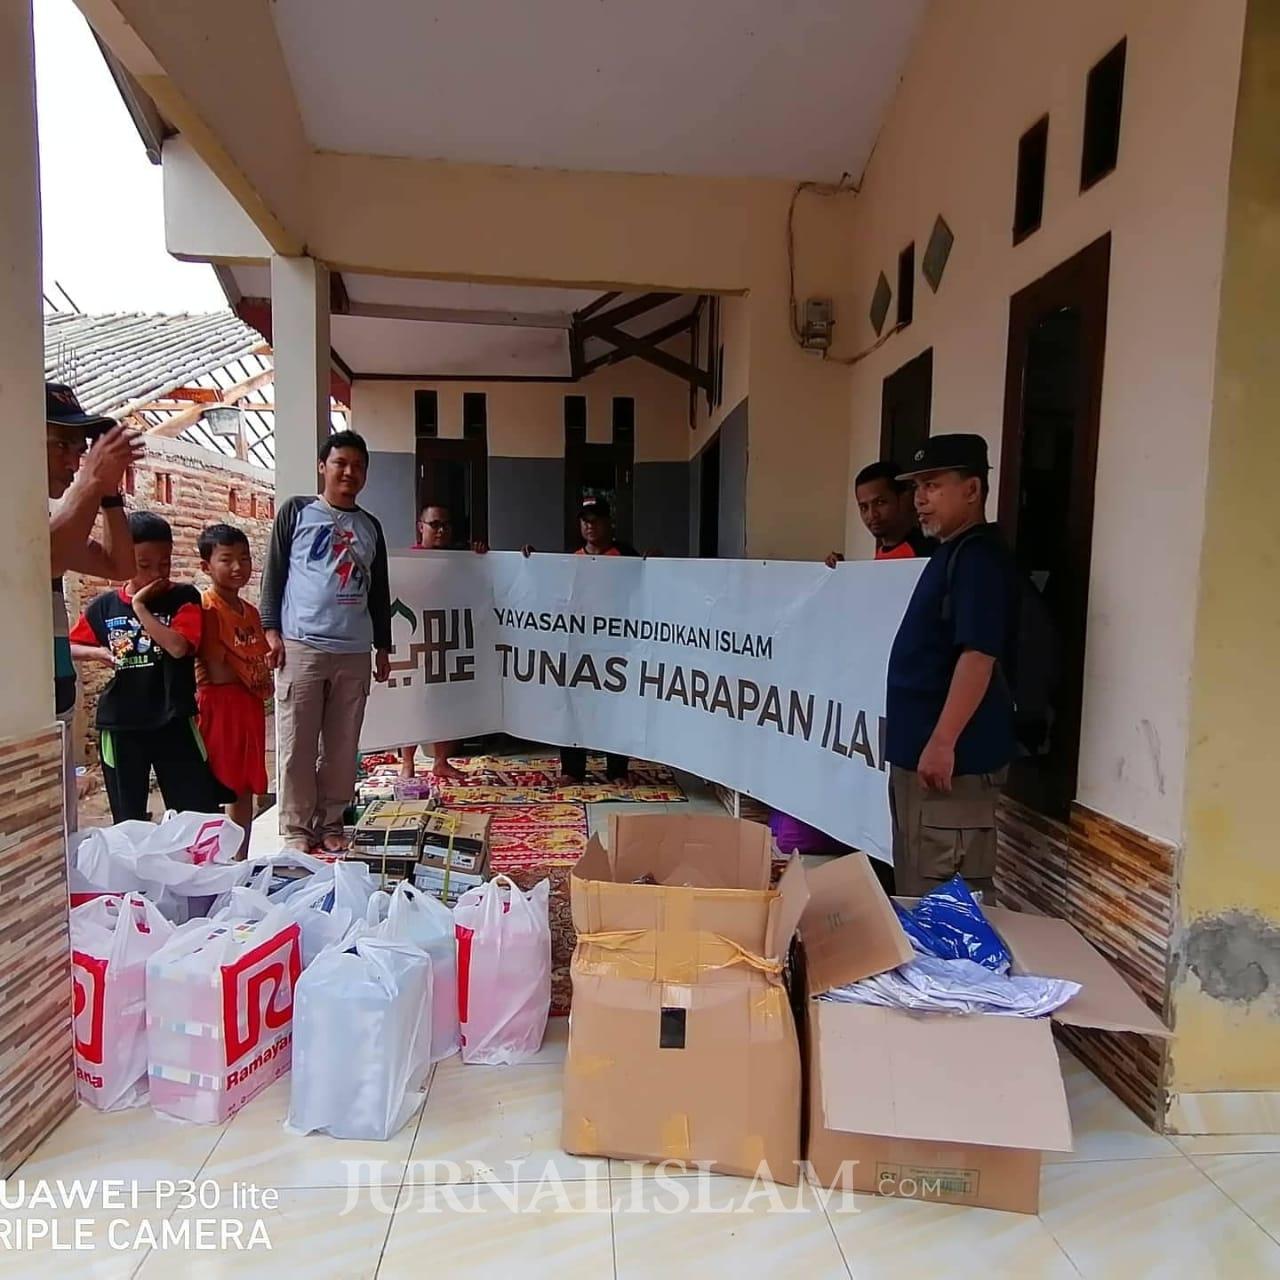 YPI Tunas Harapan Ilahi Serahkan Bantuan untuk Korban Banjir Lebak